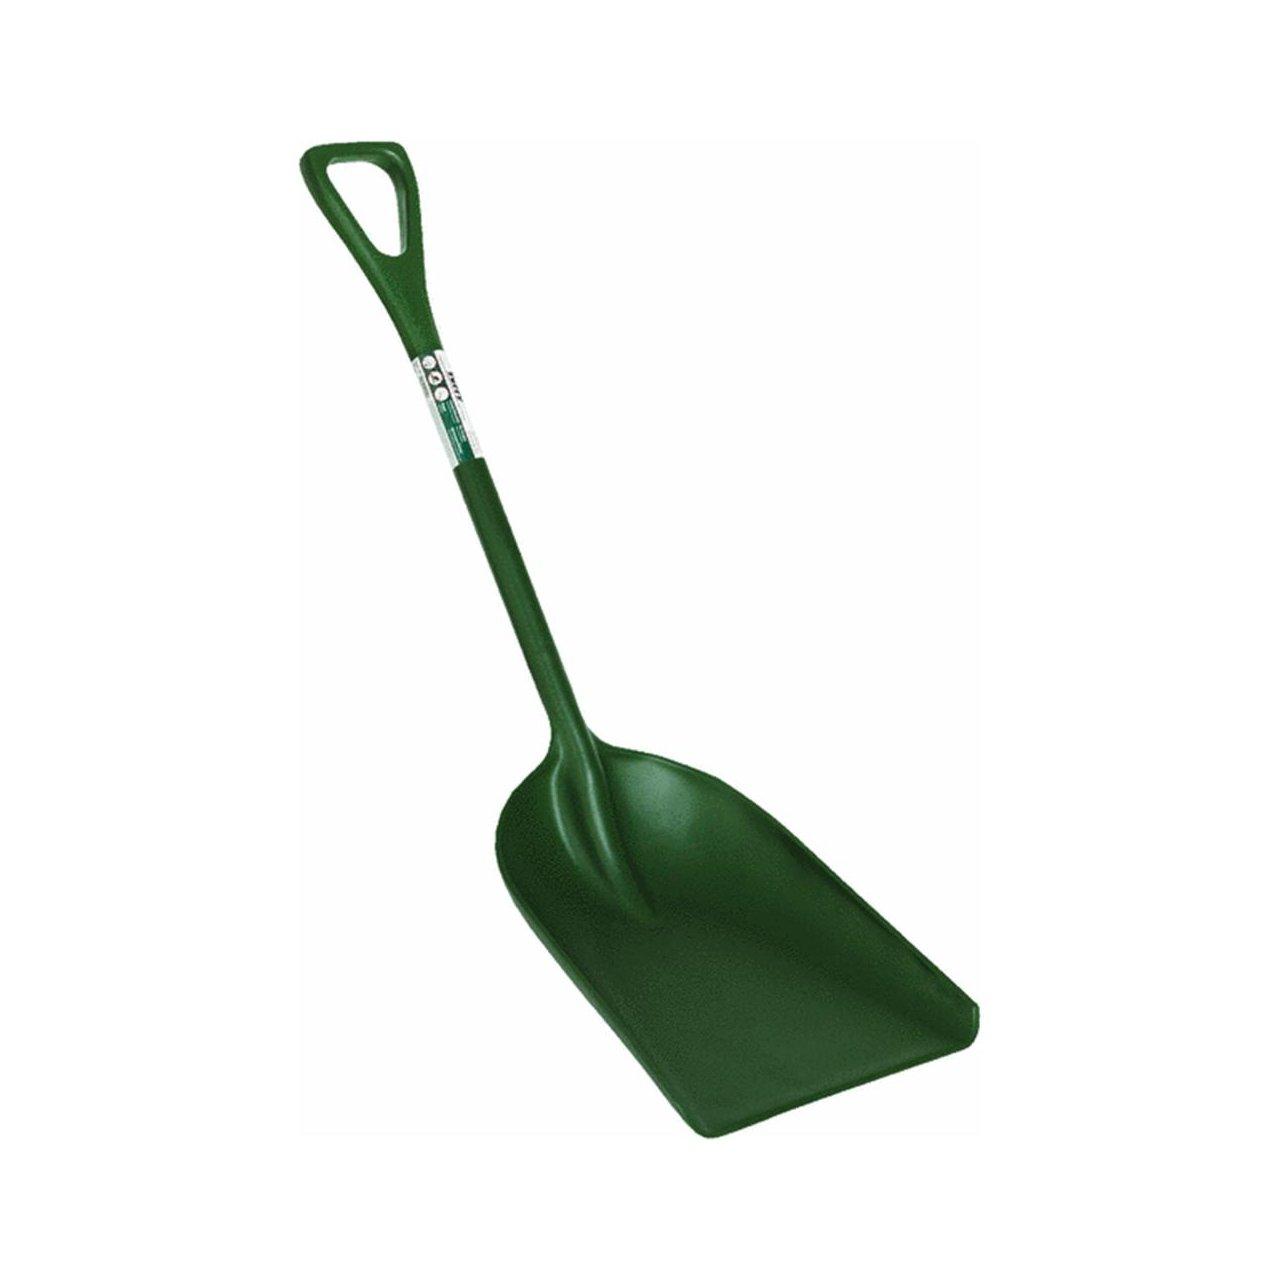 Amazon.com : POLY PRO TOOLS P 6982G Tuffy Scoop Shovel, 4 Lb, Green :  Patio, Lawn U0026 Garden